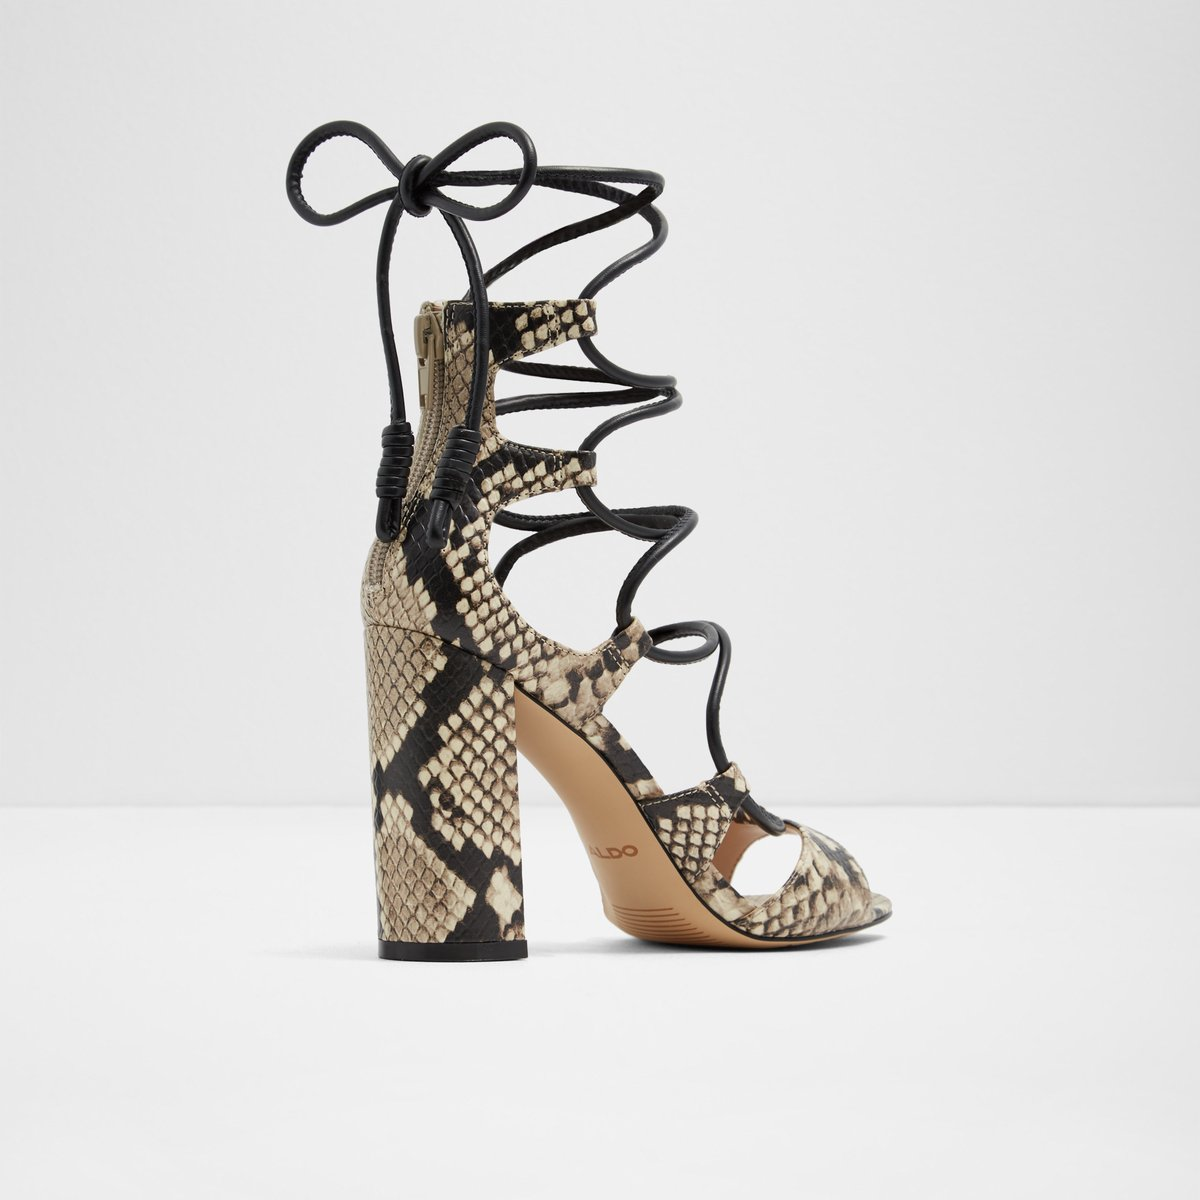 5698b4bc8491 Miadia Natural Print Women s Heeled sandals